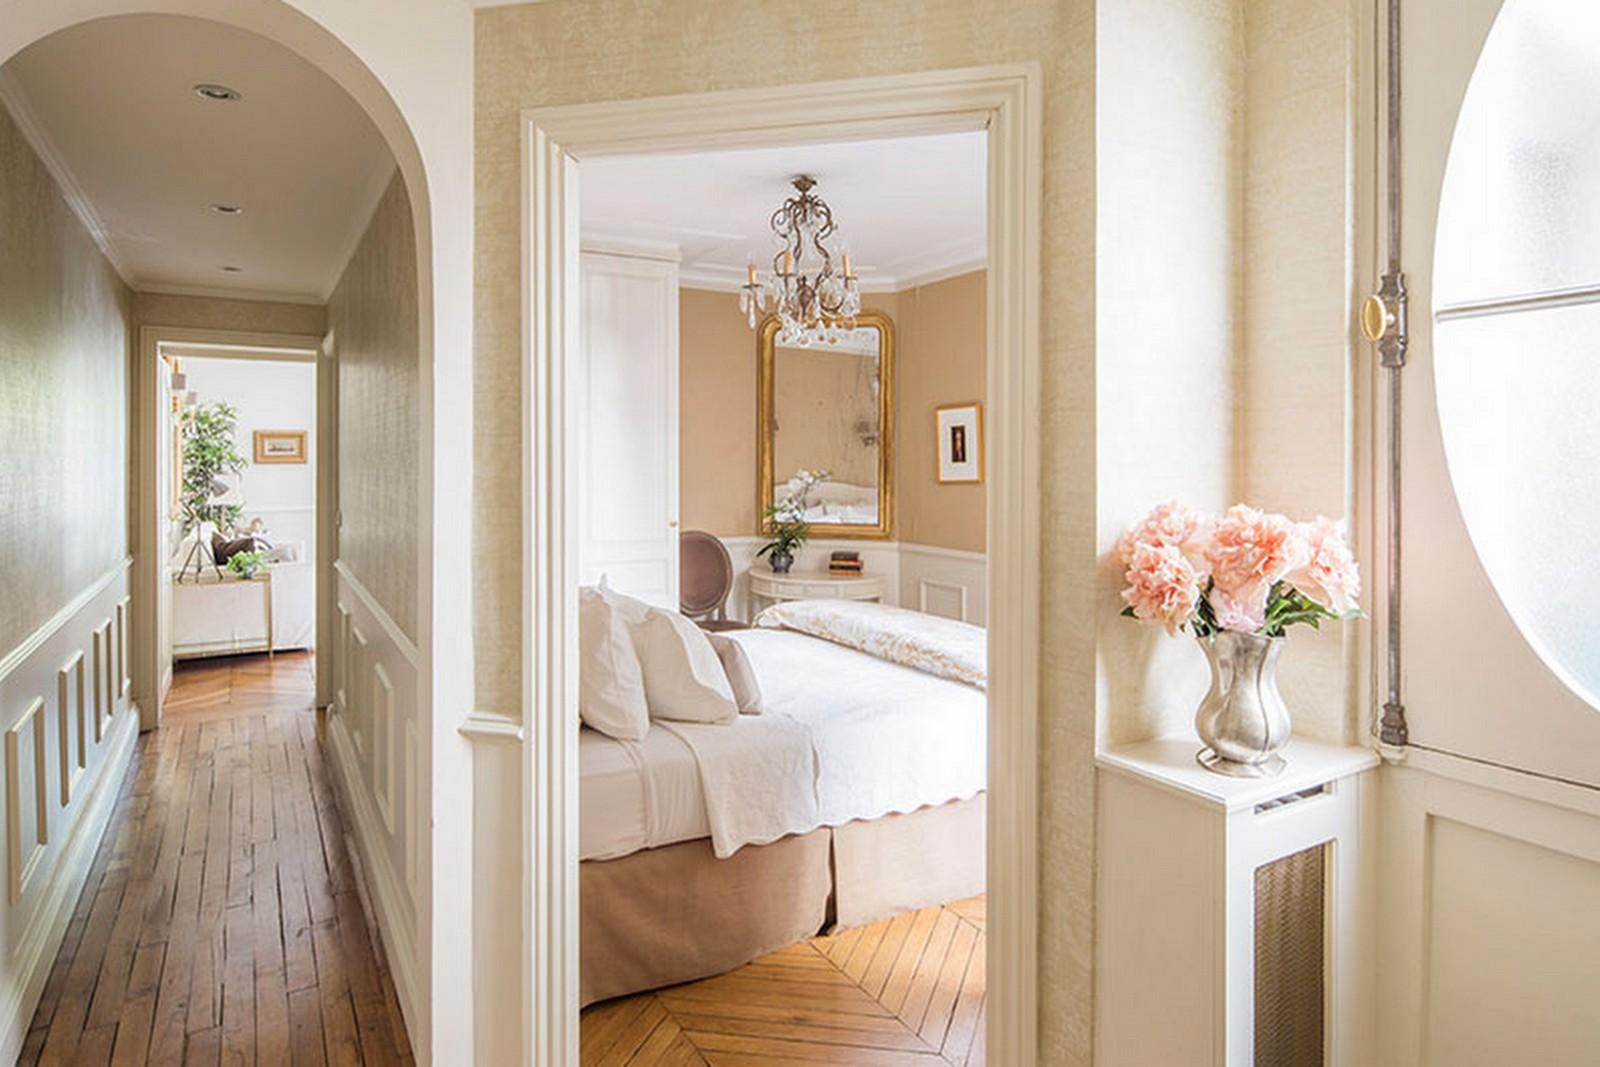 Decor inspiration | A Paris Apartment | Cool Chic Style ...